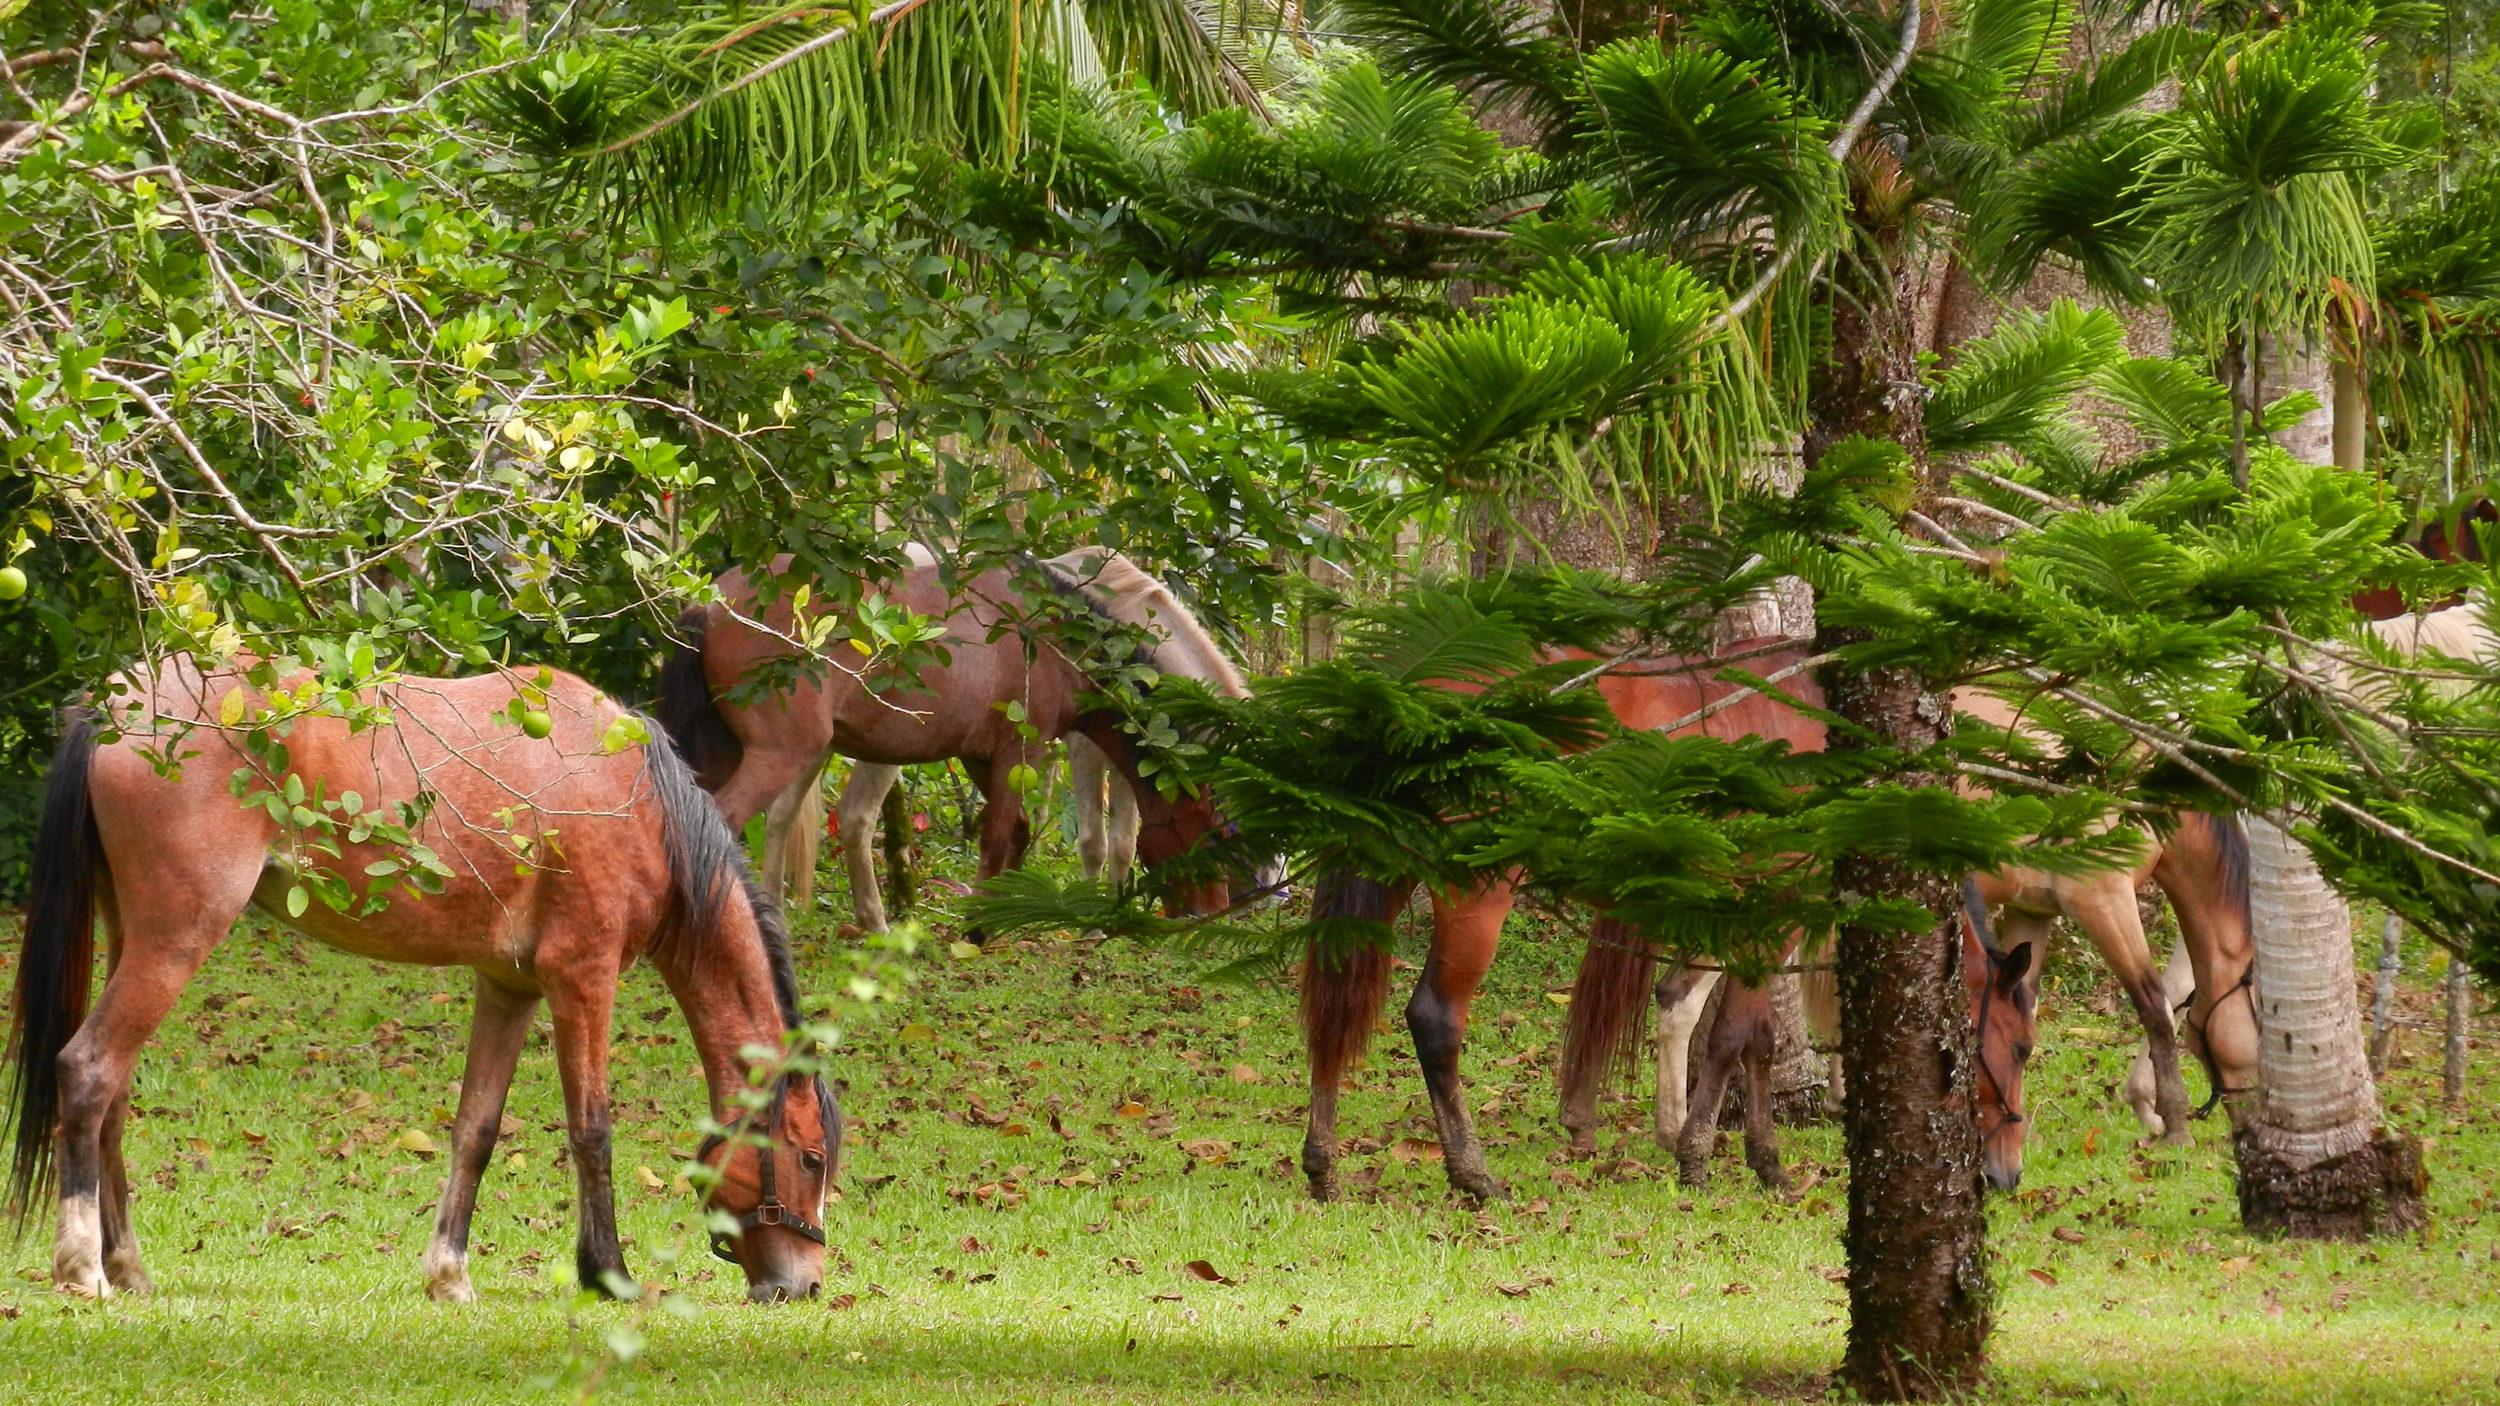 Jungle horse herd grazing